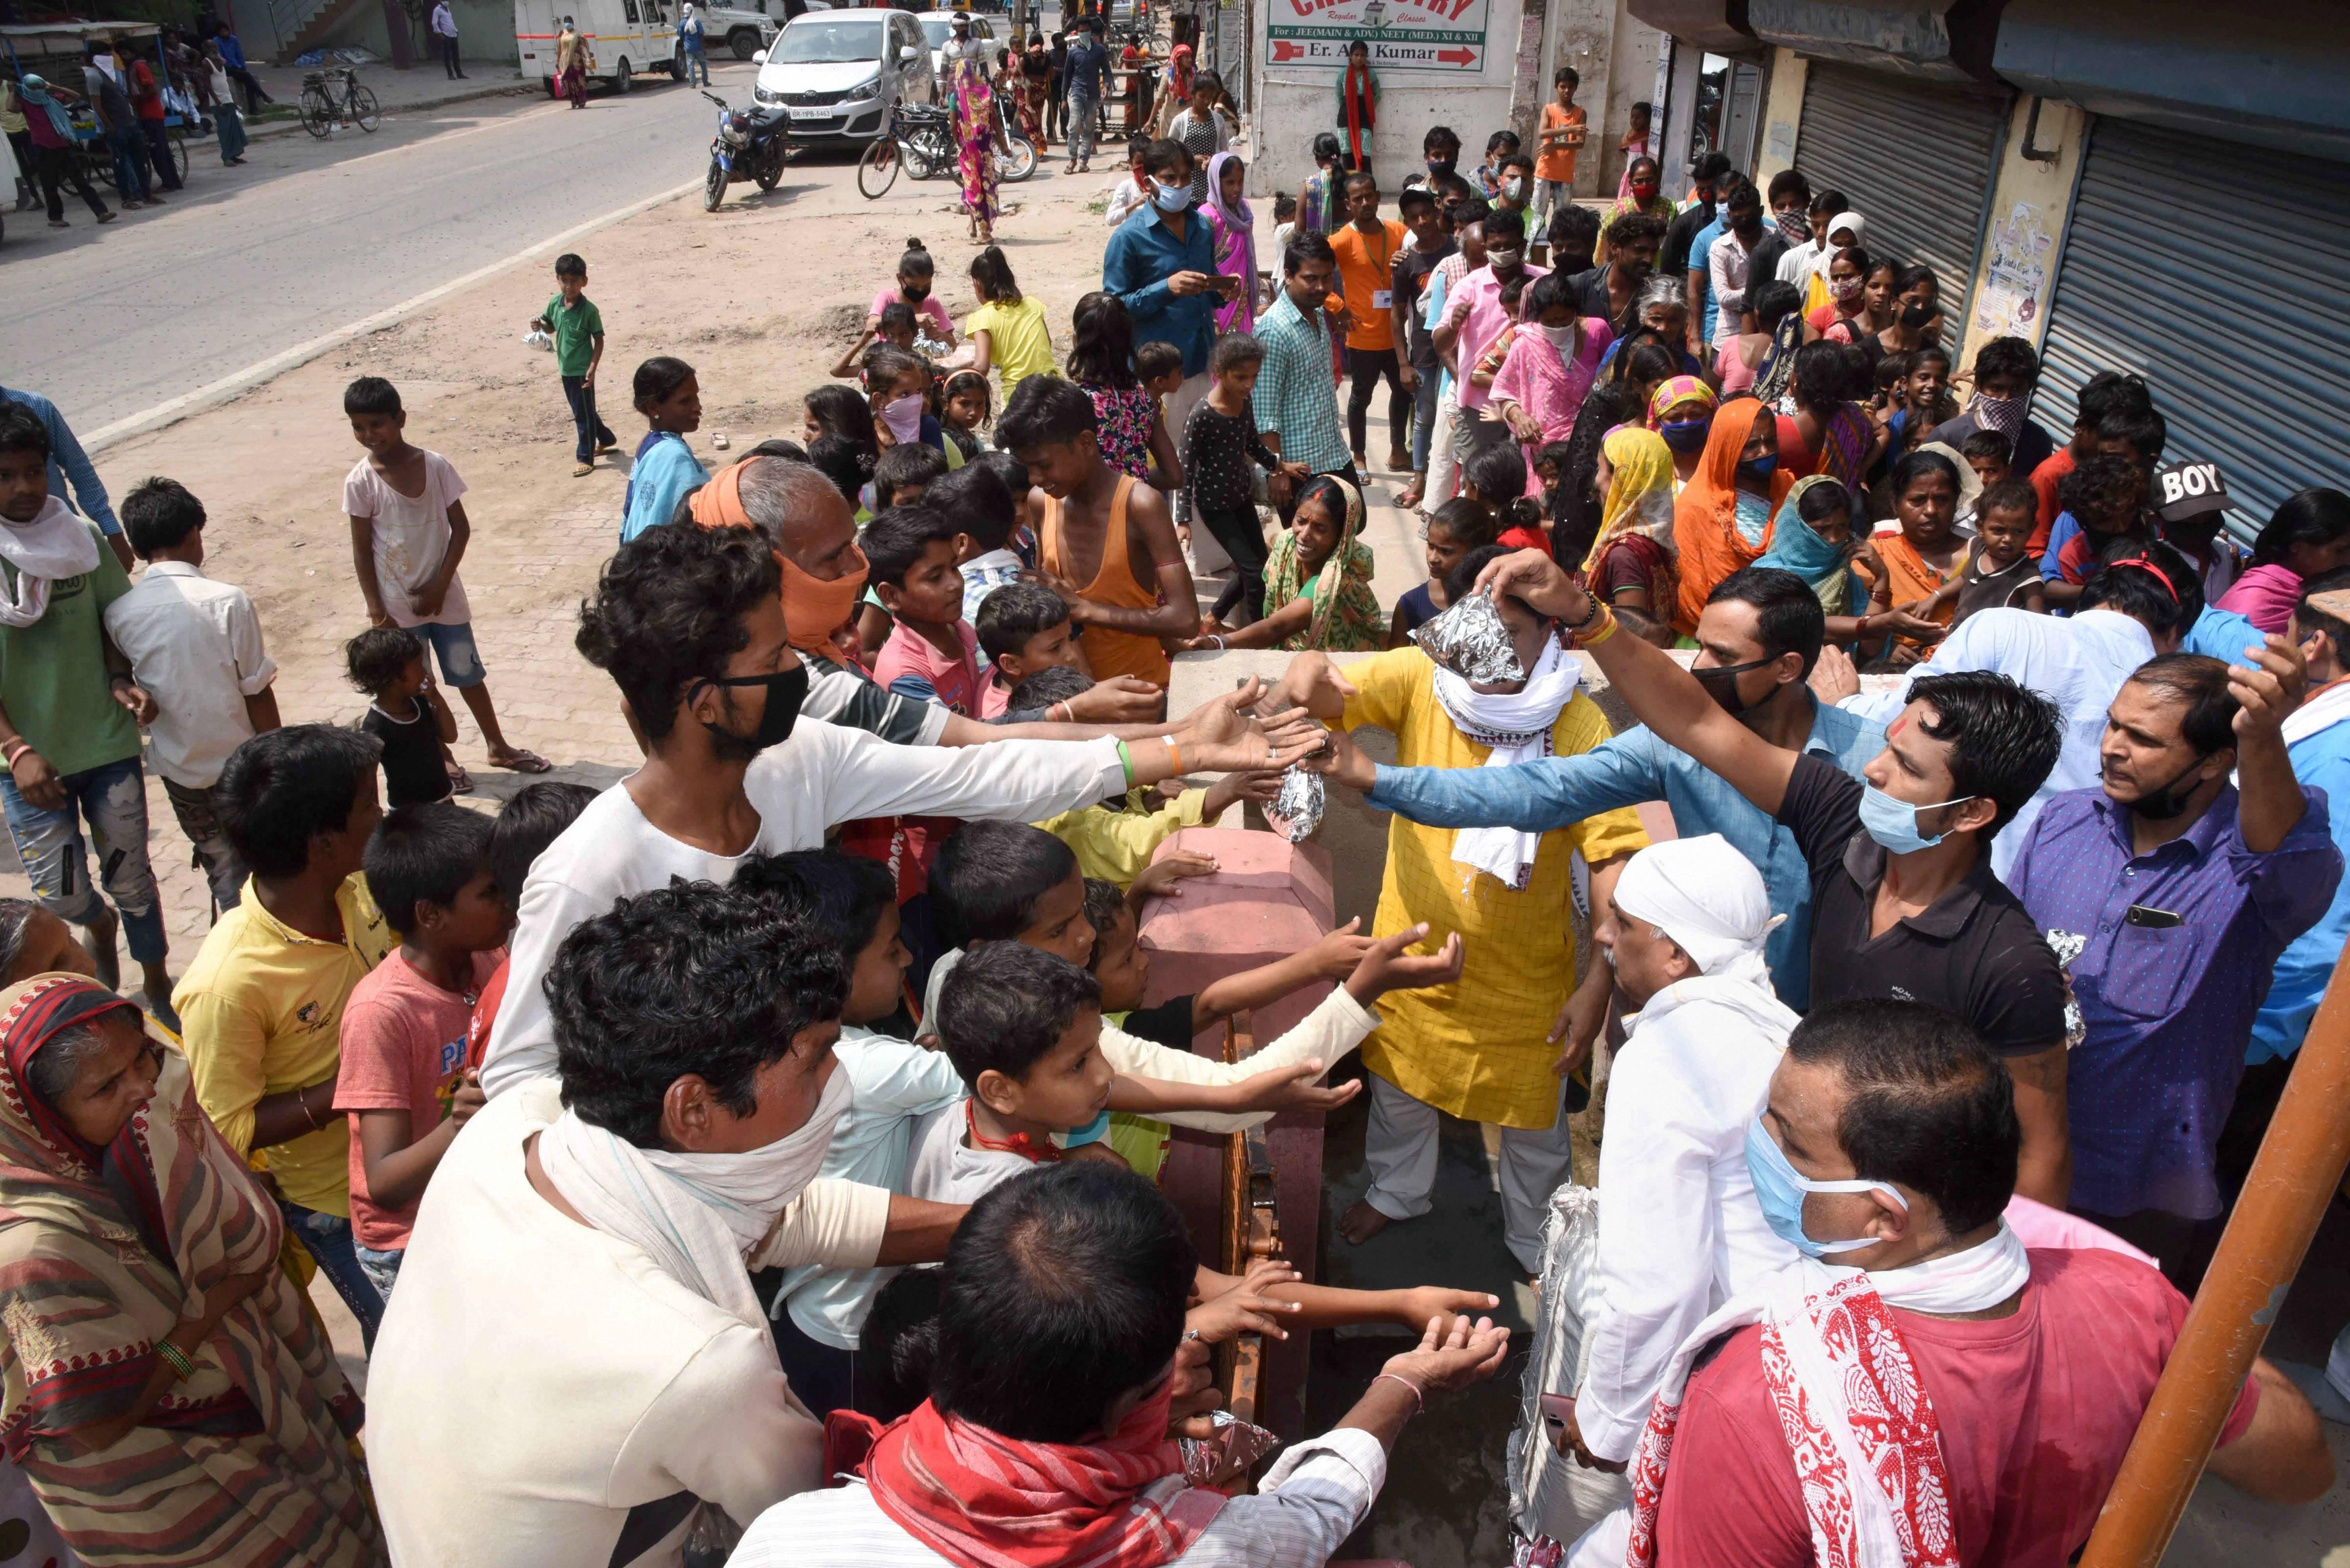 Volunteers distribute food to needy people during the nationwide lockdown, in wake of the coronavirus pandemic, in Patna.